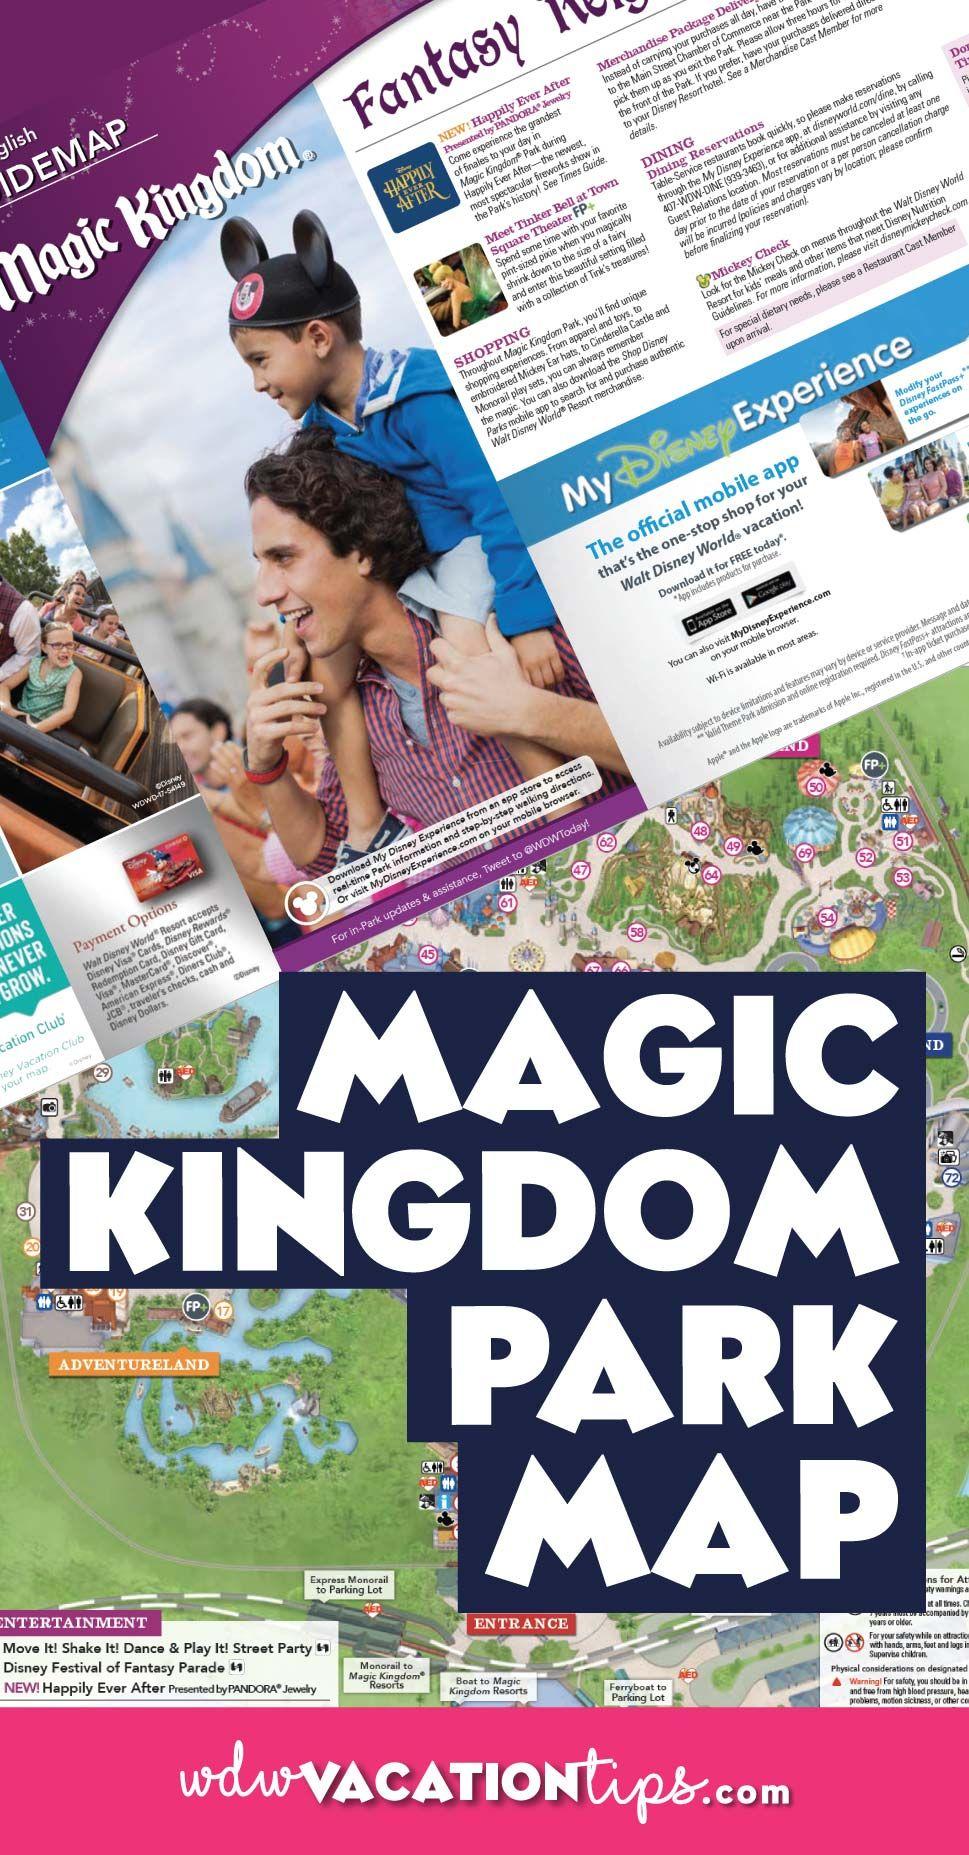 Magic Kingdom Map Disney World | Disney | Pinterest | Disney, Disney ...